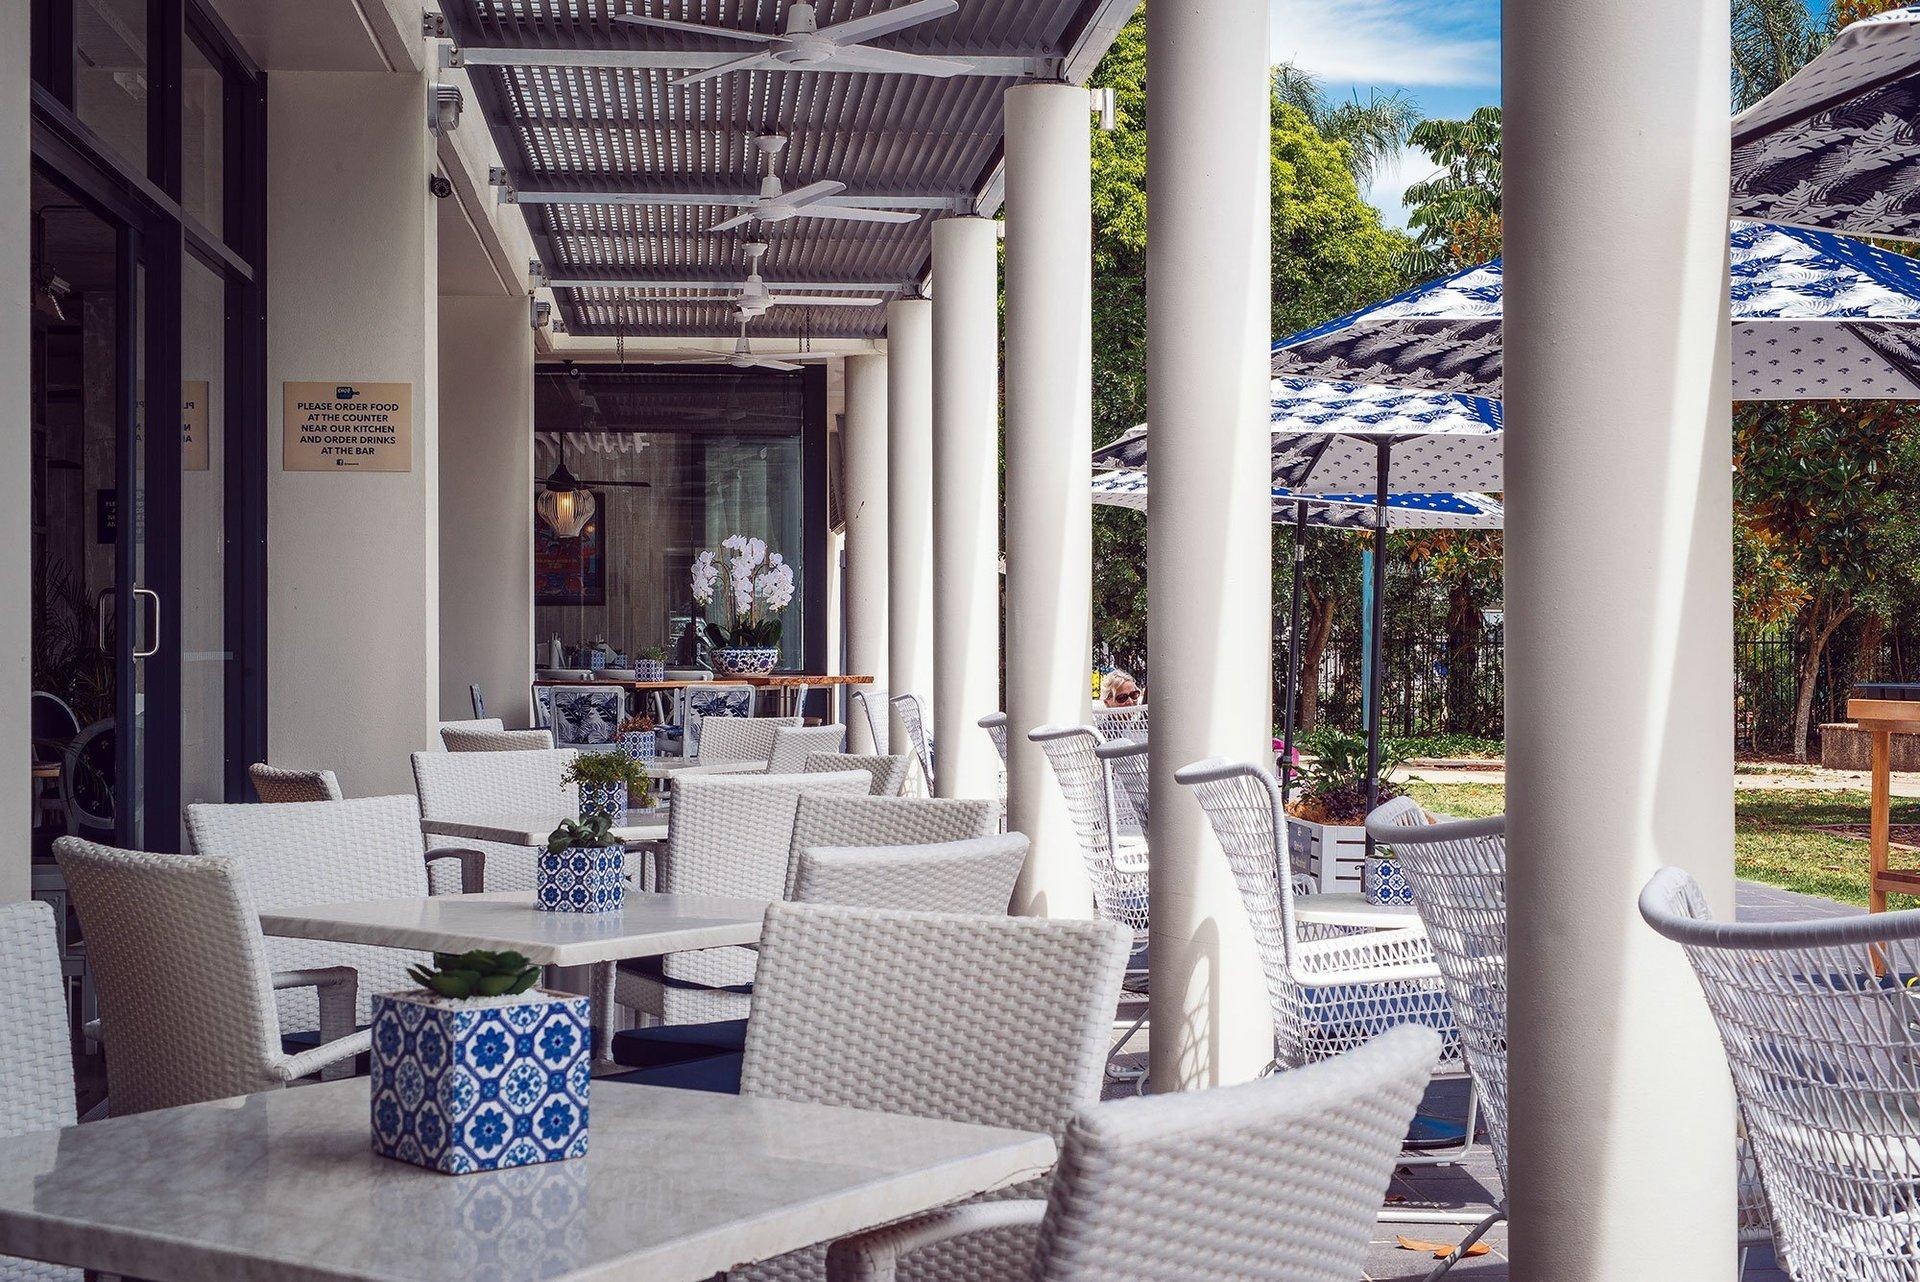 Chop 'n Chill Restaurant Outdoor View